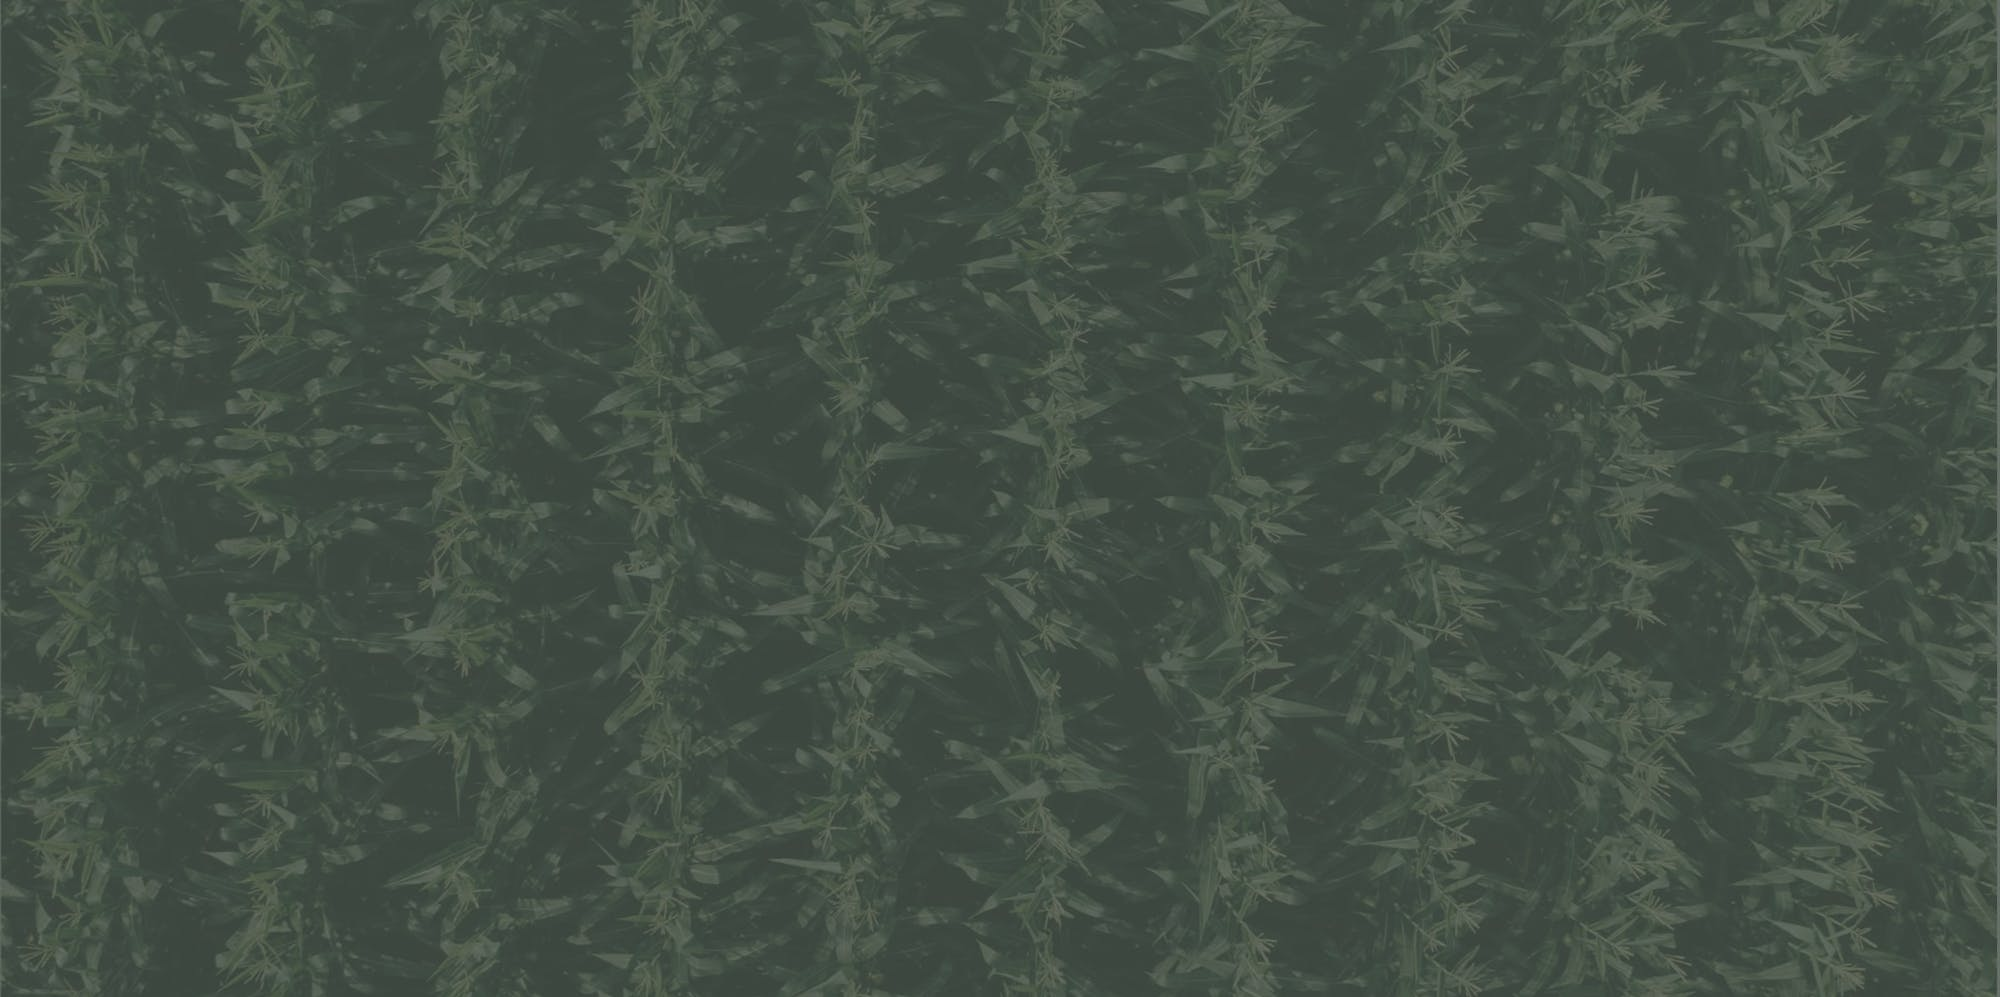 background jarallax image